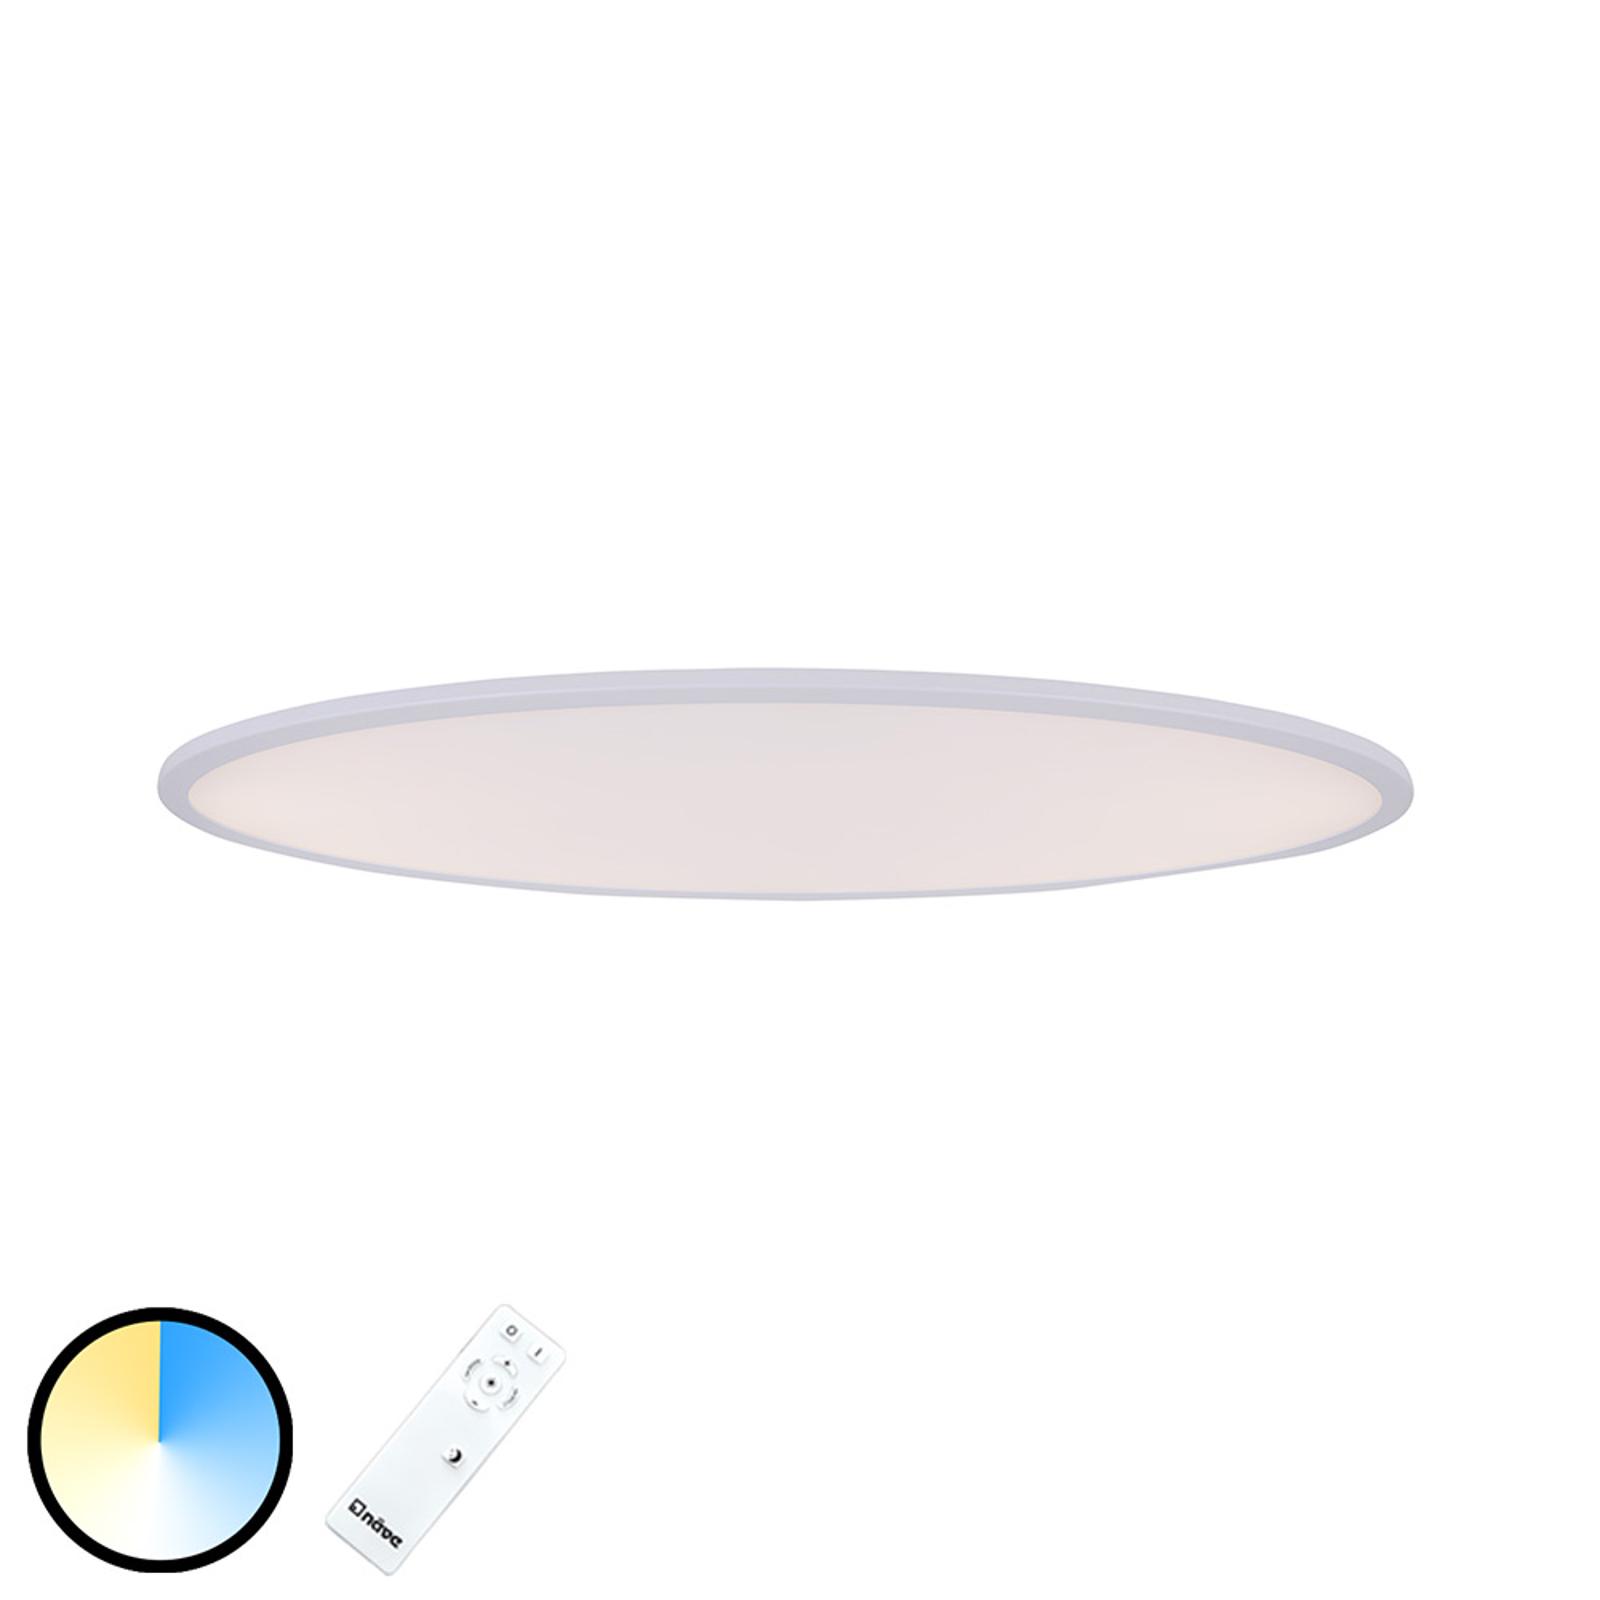 Lampa sufitowa LED Amalfi owalna 100 cm x 40 cm